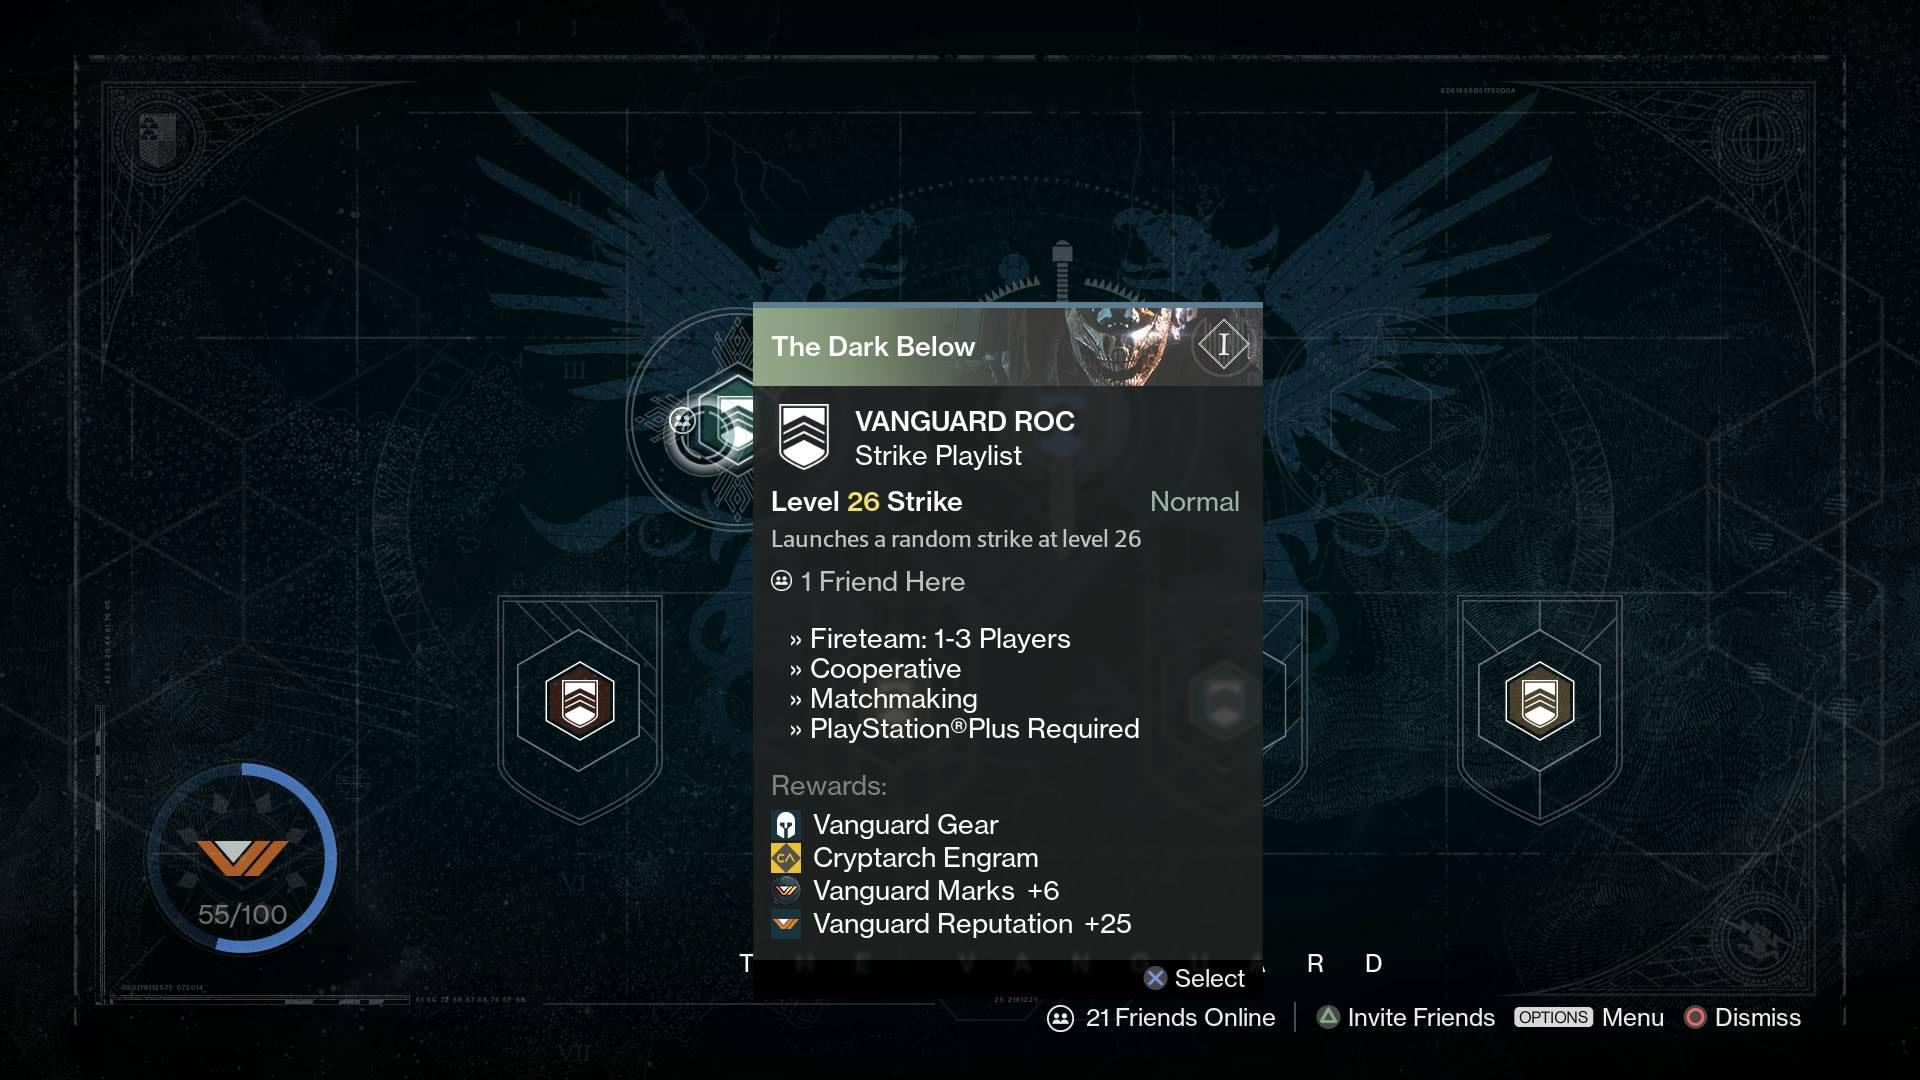 Destiny 200 Strike Project Reveals Loot Drop Secrets VG247